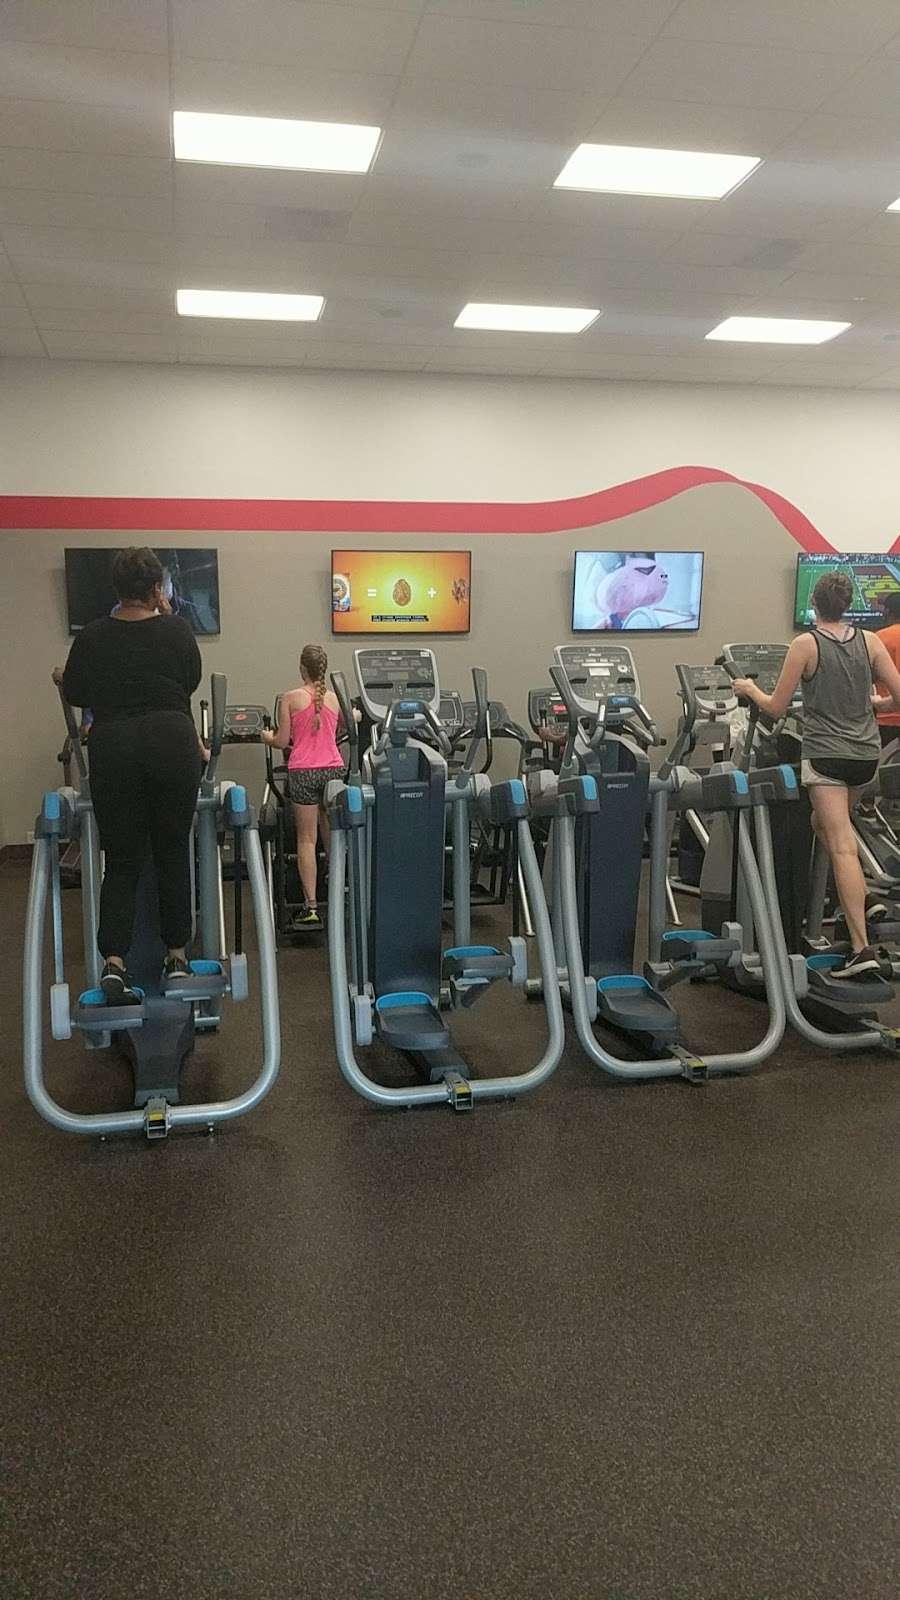 Cook/Douglass Recreation Center - gym  | Photo 10 of 10 | Address: 50 Biel Rd, New Brunswick, NJ 08901, USA | Phone: (848) 932-8700